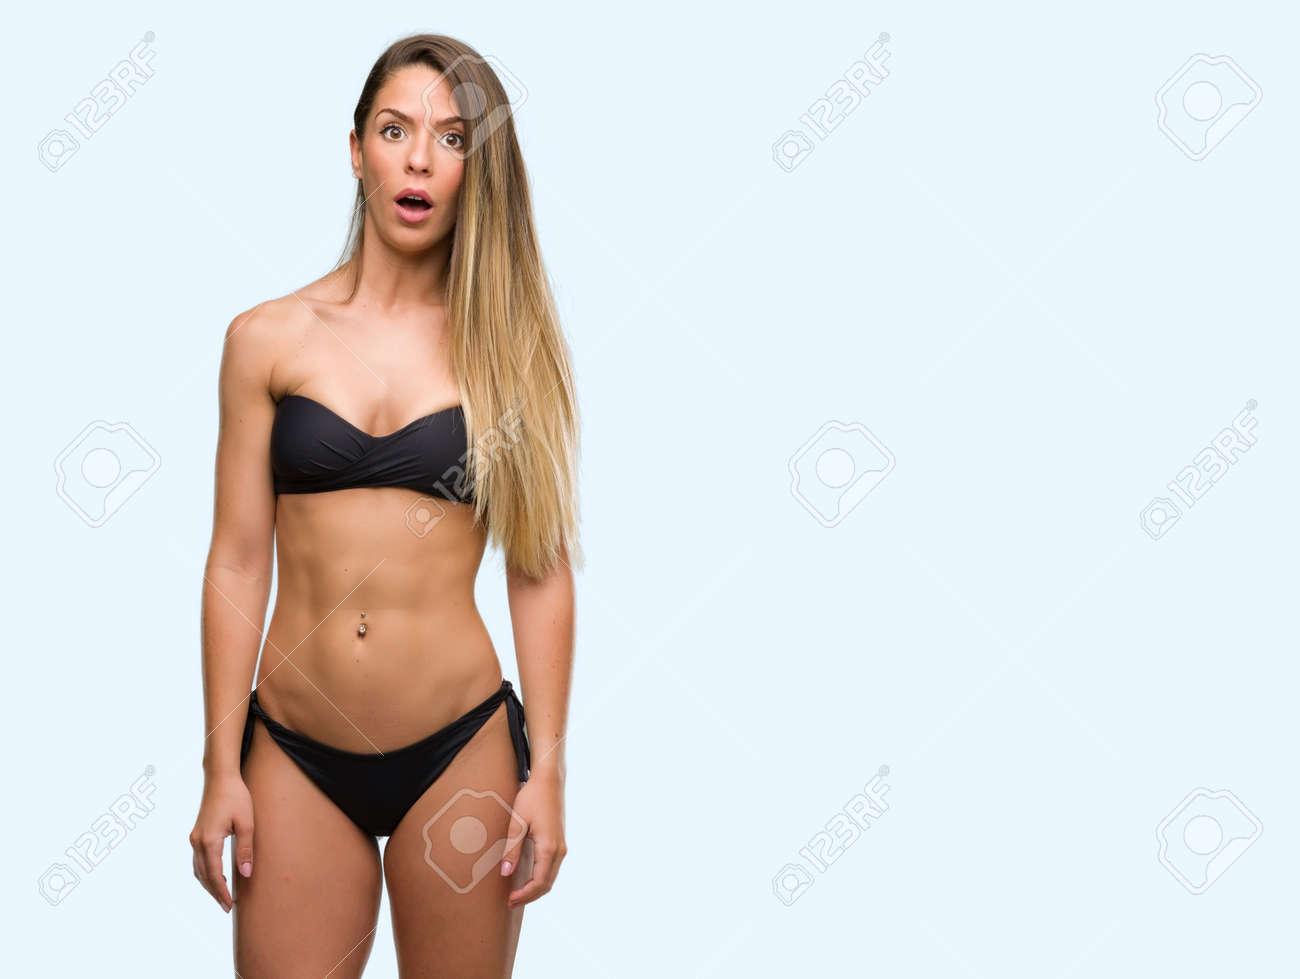 ff3b26a962819 Beautiful young woman wearing black bikini scared in shock with a surprise  face